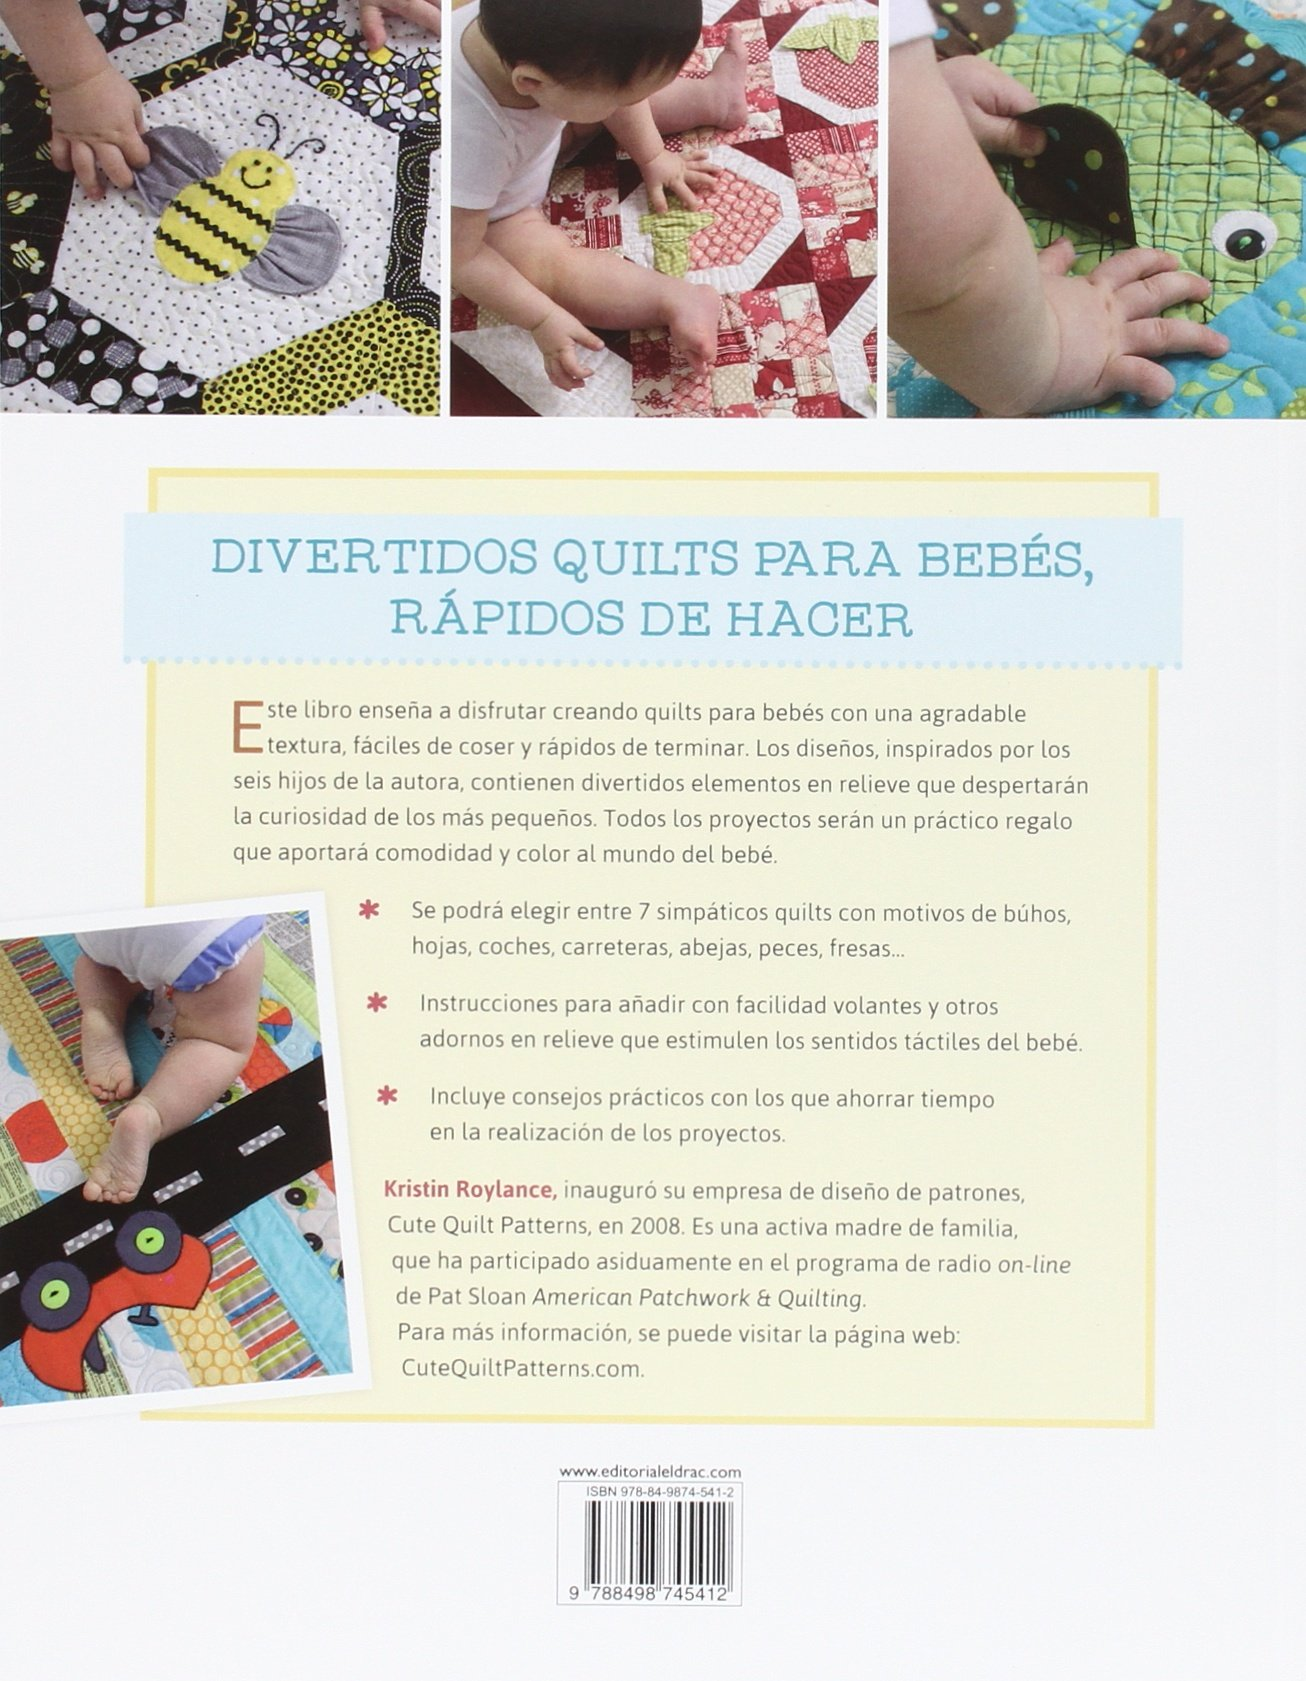 Originales Quilts Para Bebés: Amazon.es: Kristin Roylance, Laia ...